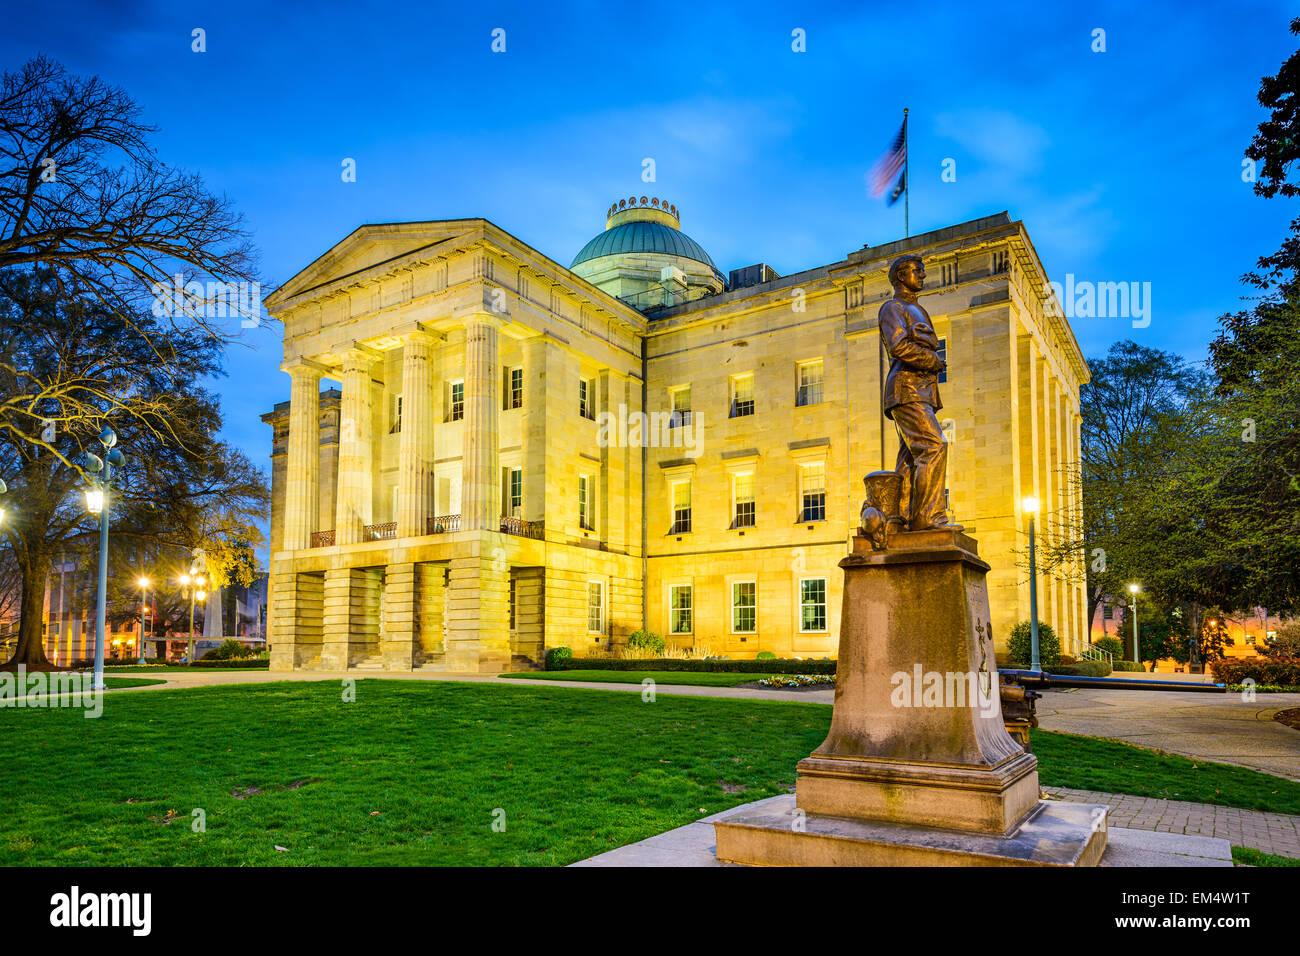 Raleigh, North Carolina, Stati Uniti d'America lo State Capitol Building. Immagini Stock